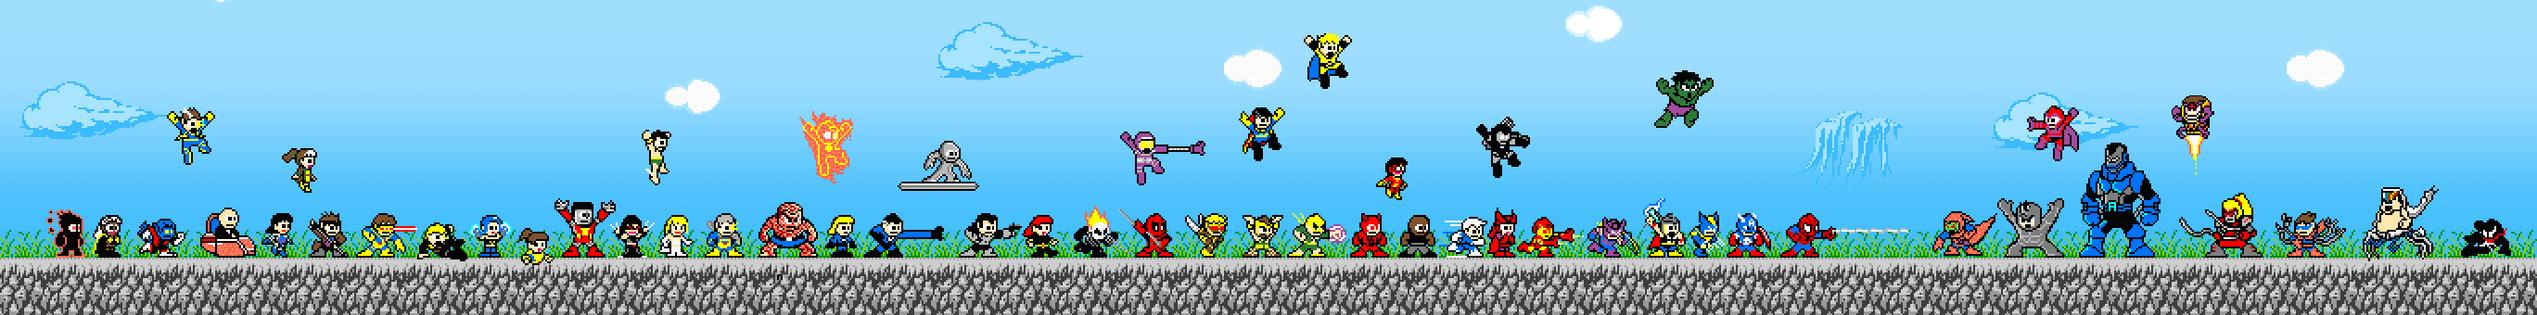 Marvel Megas by suzuran